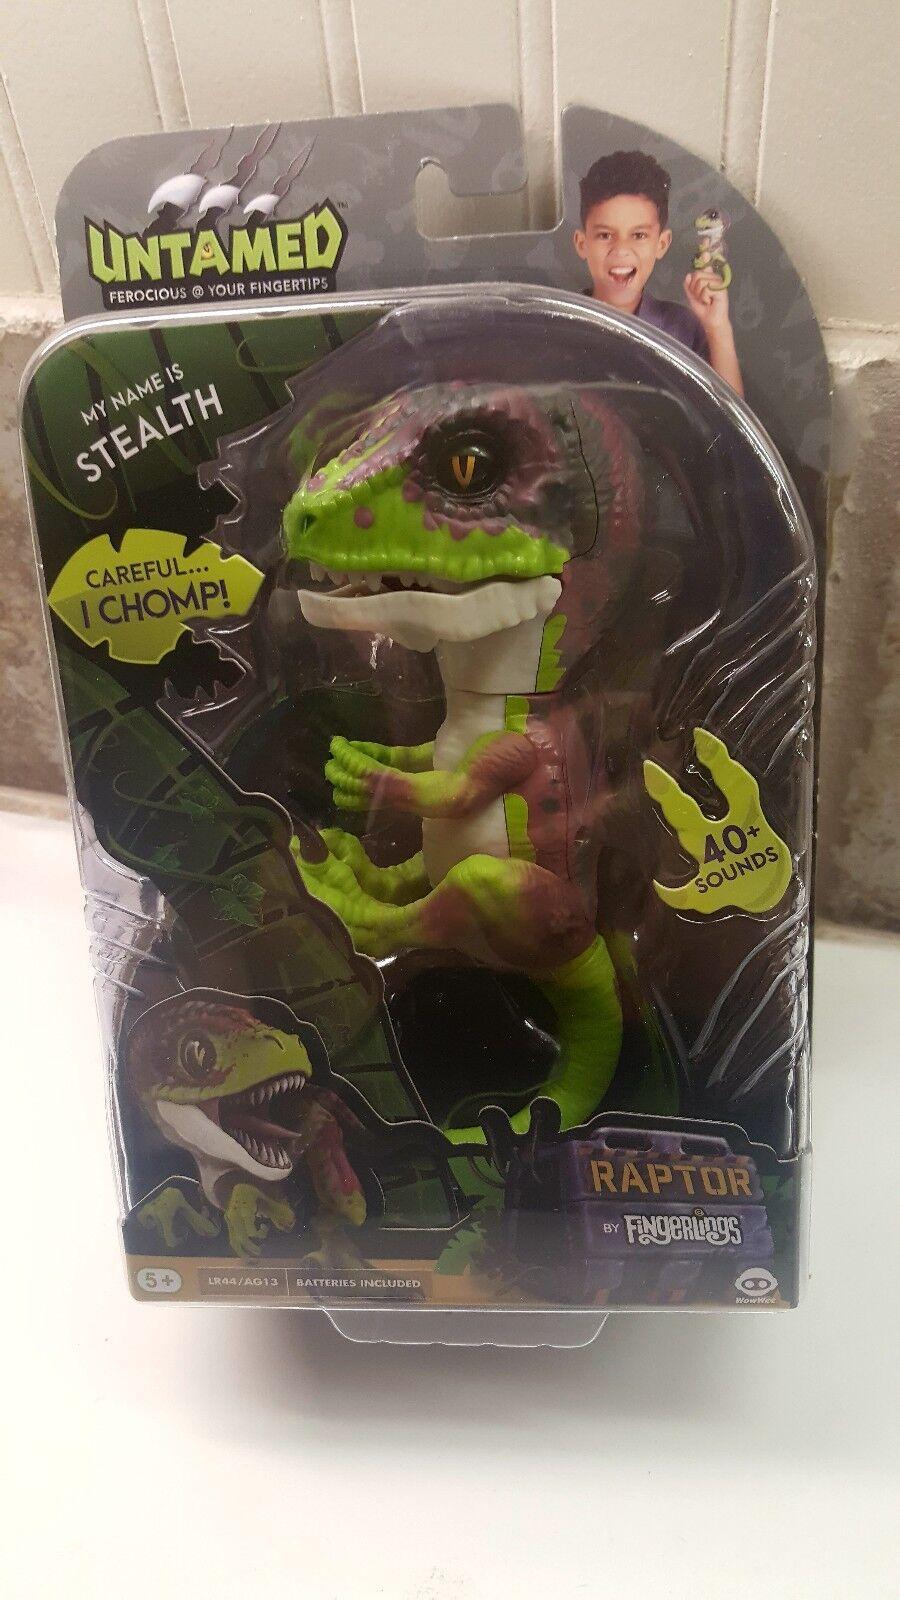 Fingerlings Stealth Raptor Grün lila Untamed Interactive Dinosaur by WowWee